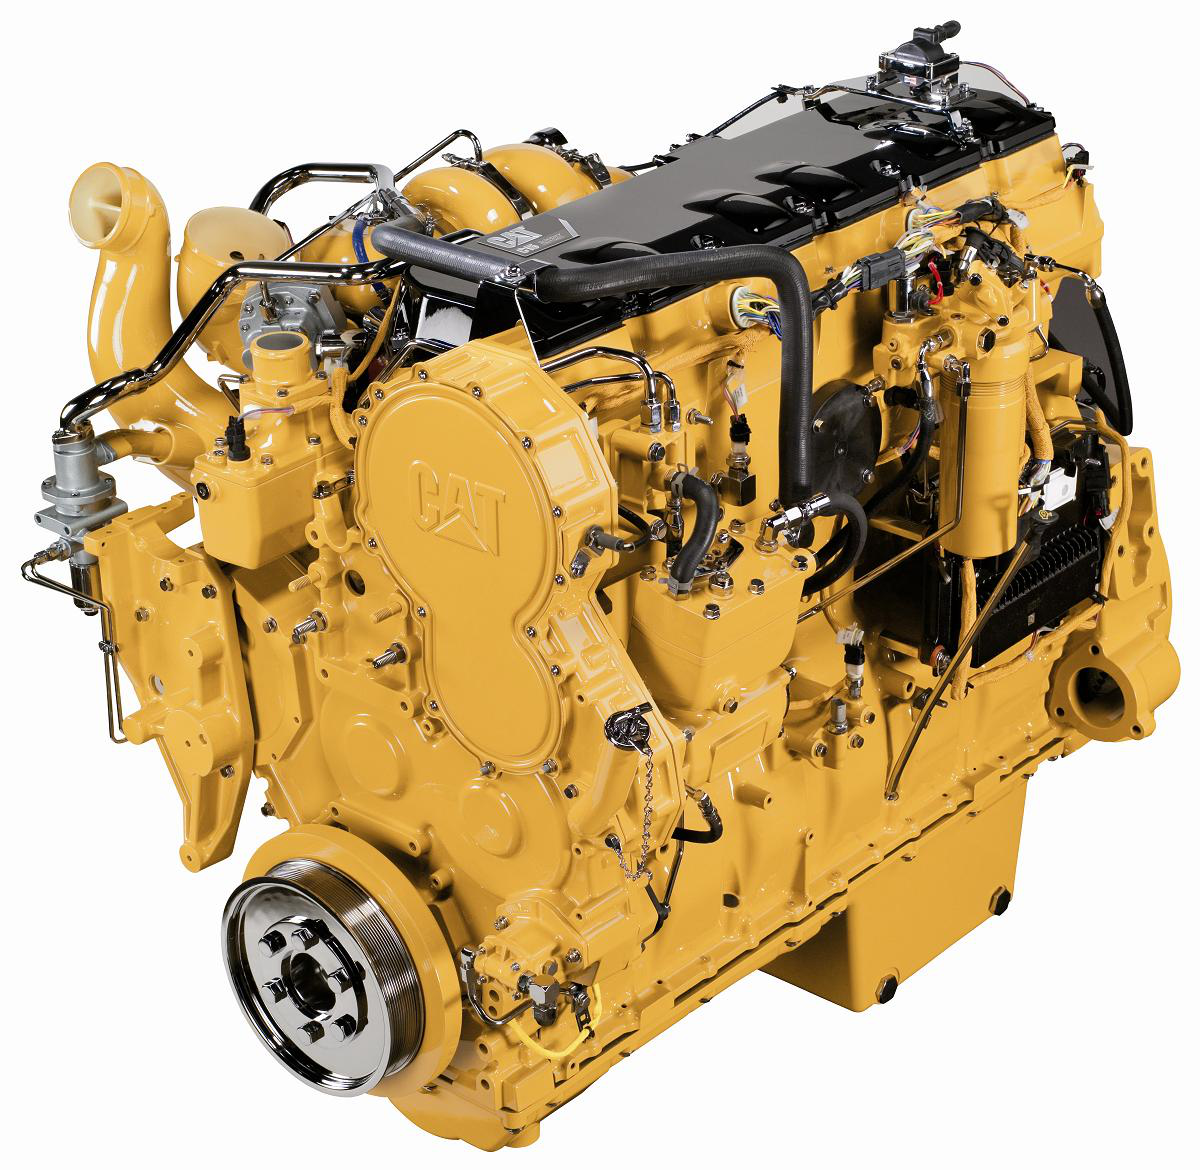 caterpillar settles engine lawsuit for 60m to acert owners rh ccjdigital com Caterpillar C18 Truck Engine Cat C18 Timing